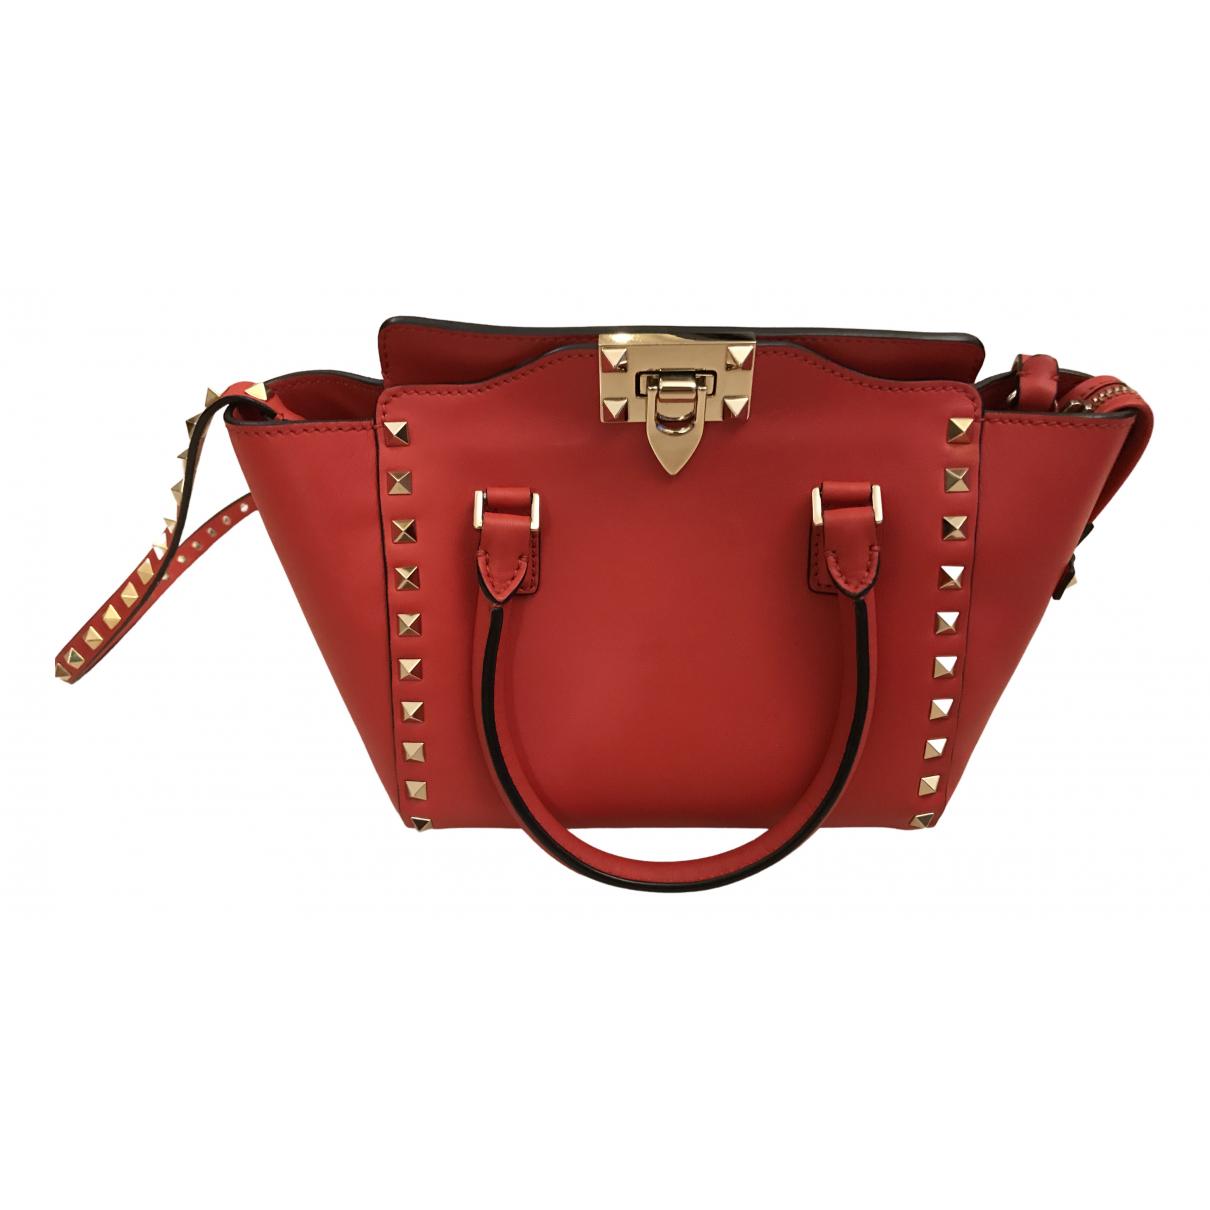 Valentino Garavani - Sac a main Rockstud pour femme en cuir - rouge